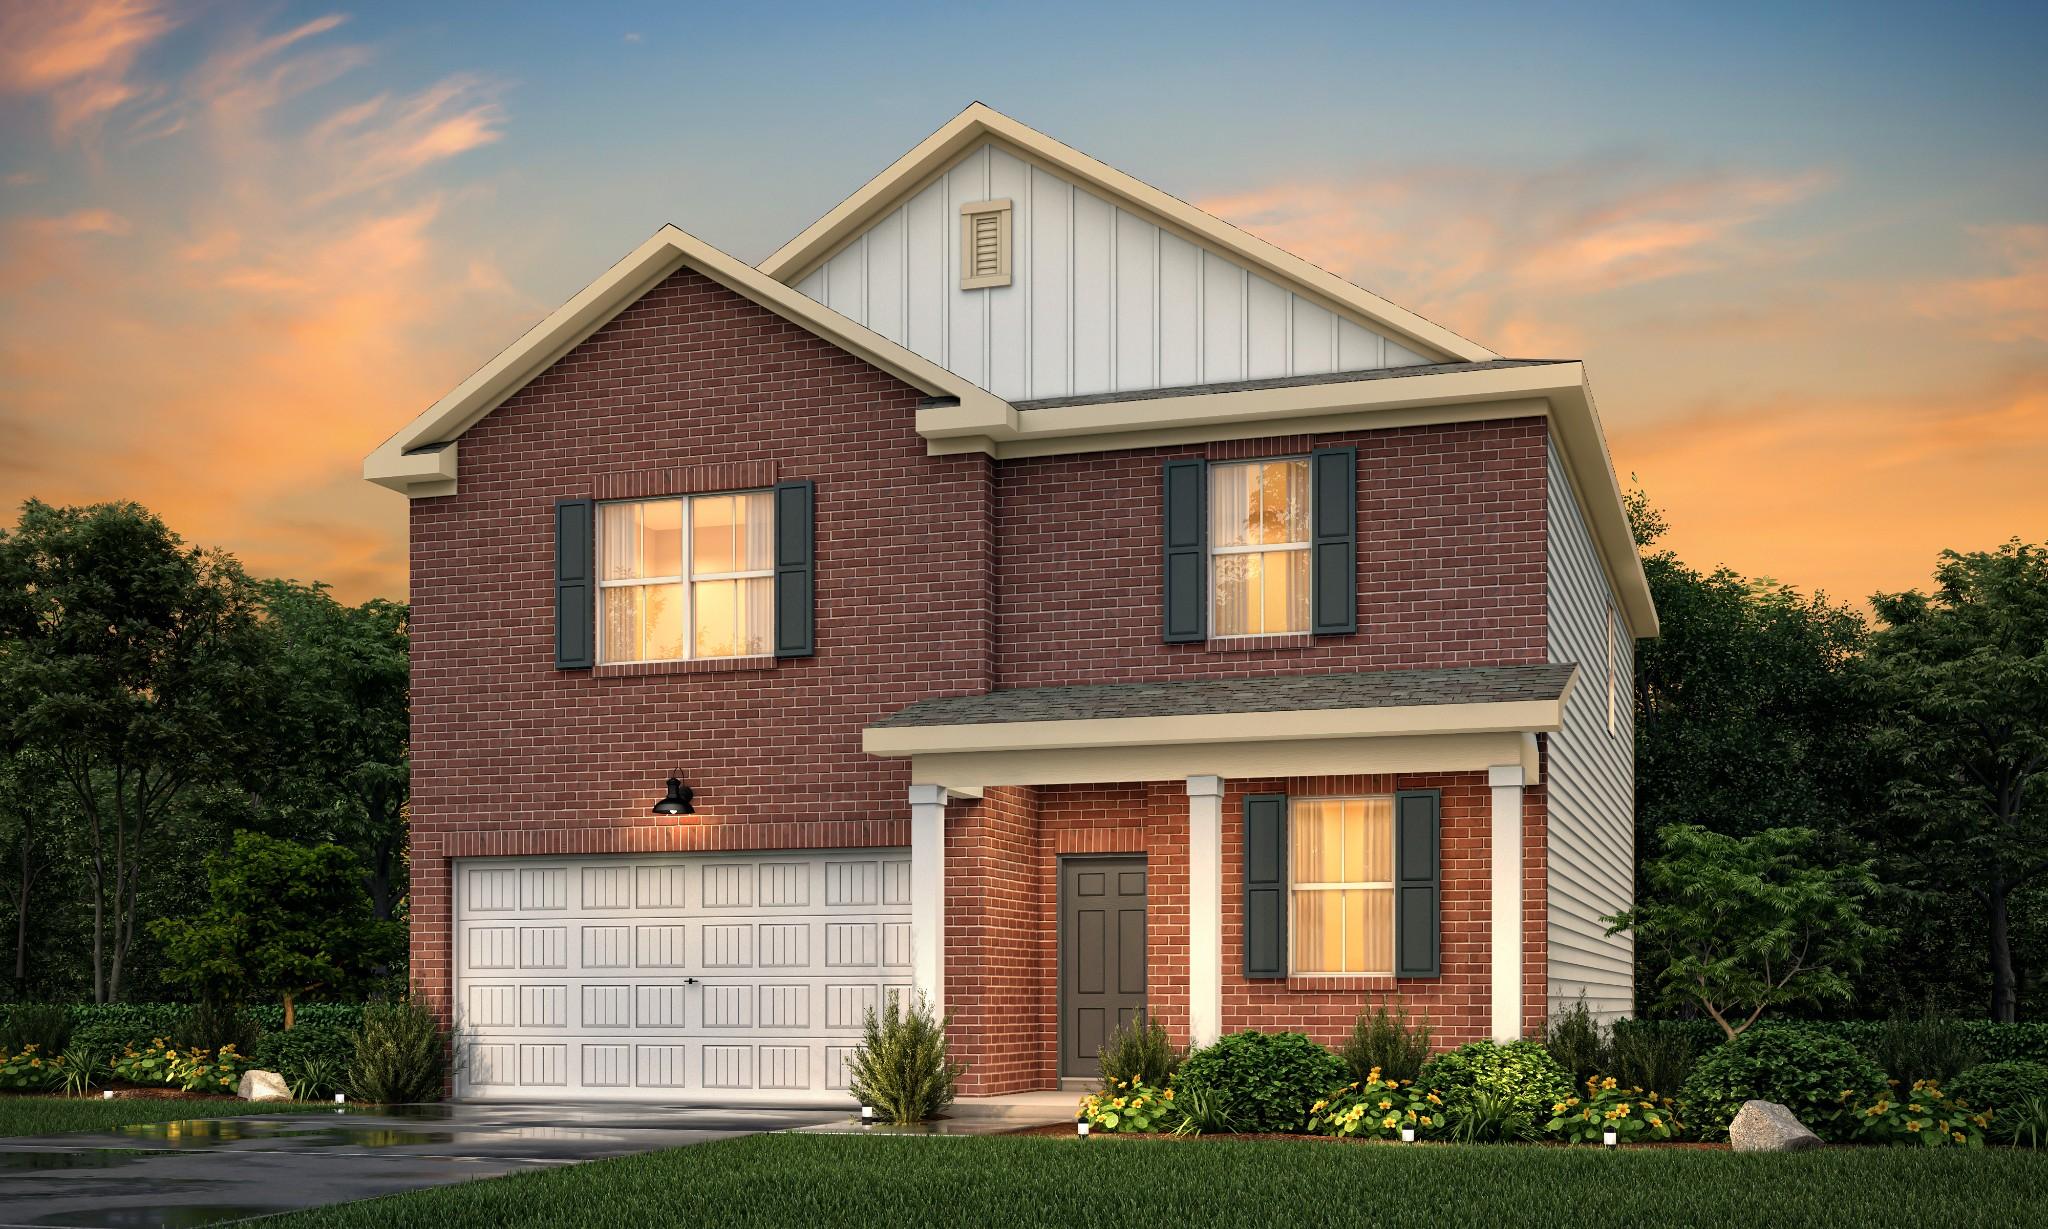 713 Amberton Drive, Smyrna, TN 37167 - Smyrna, TN real estate listing